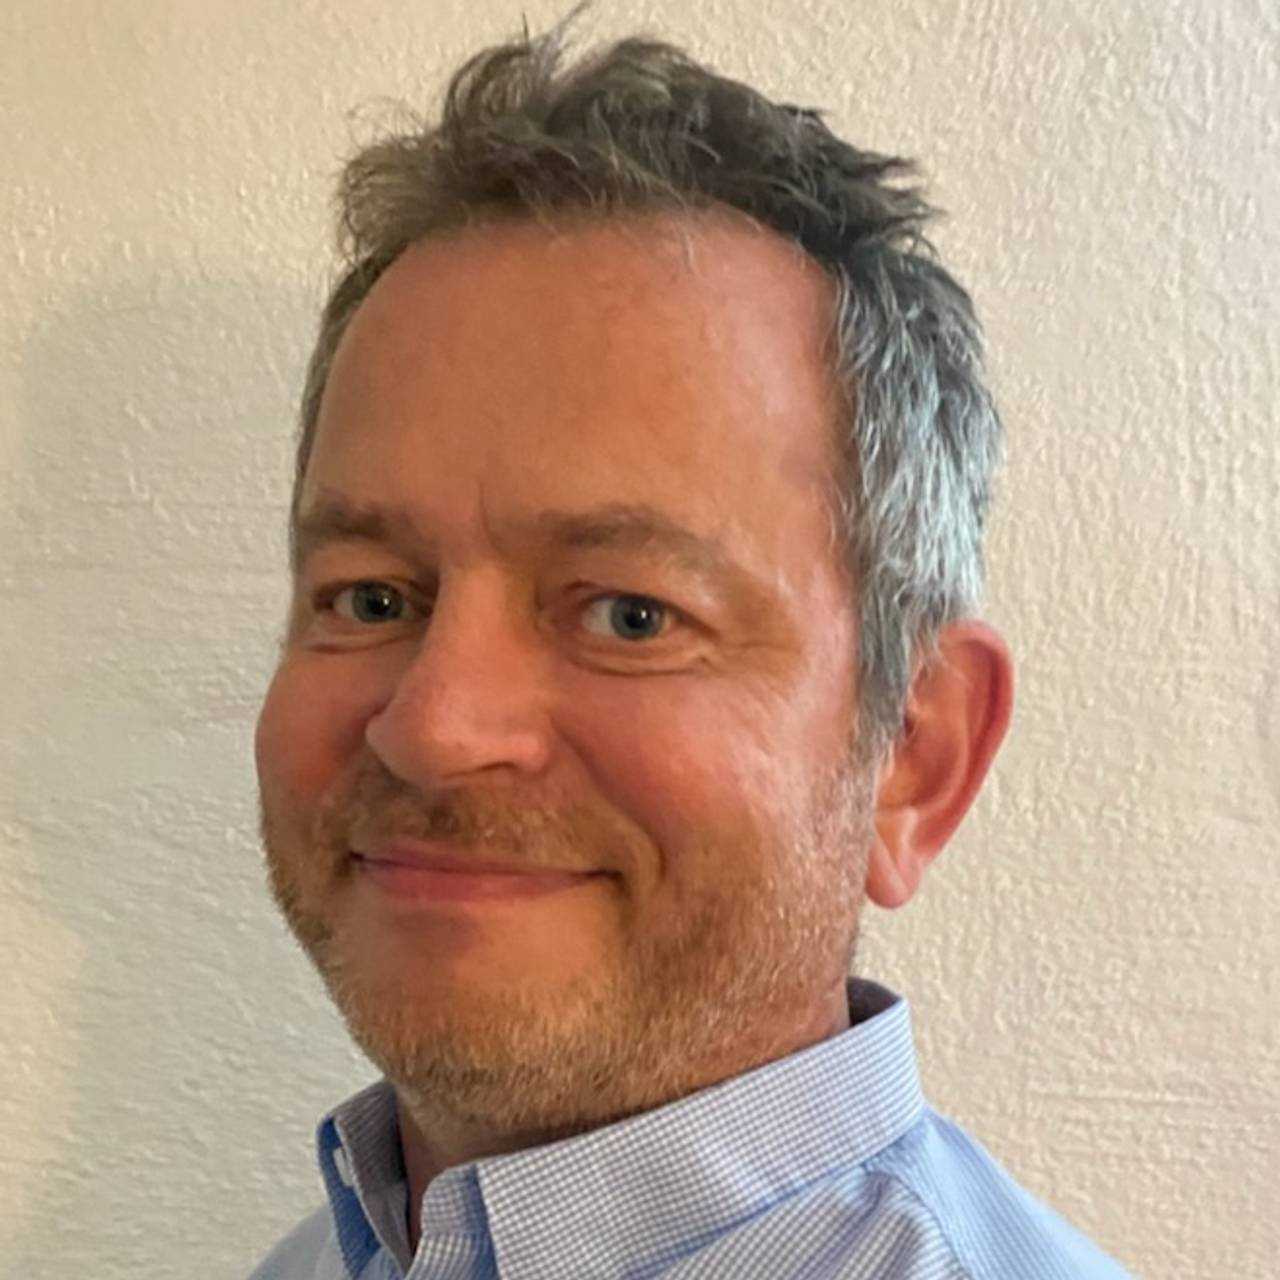 Bilde av Ulf Tore Johansen (53)